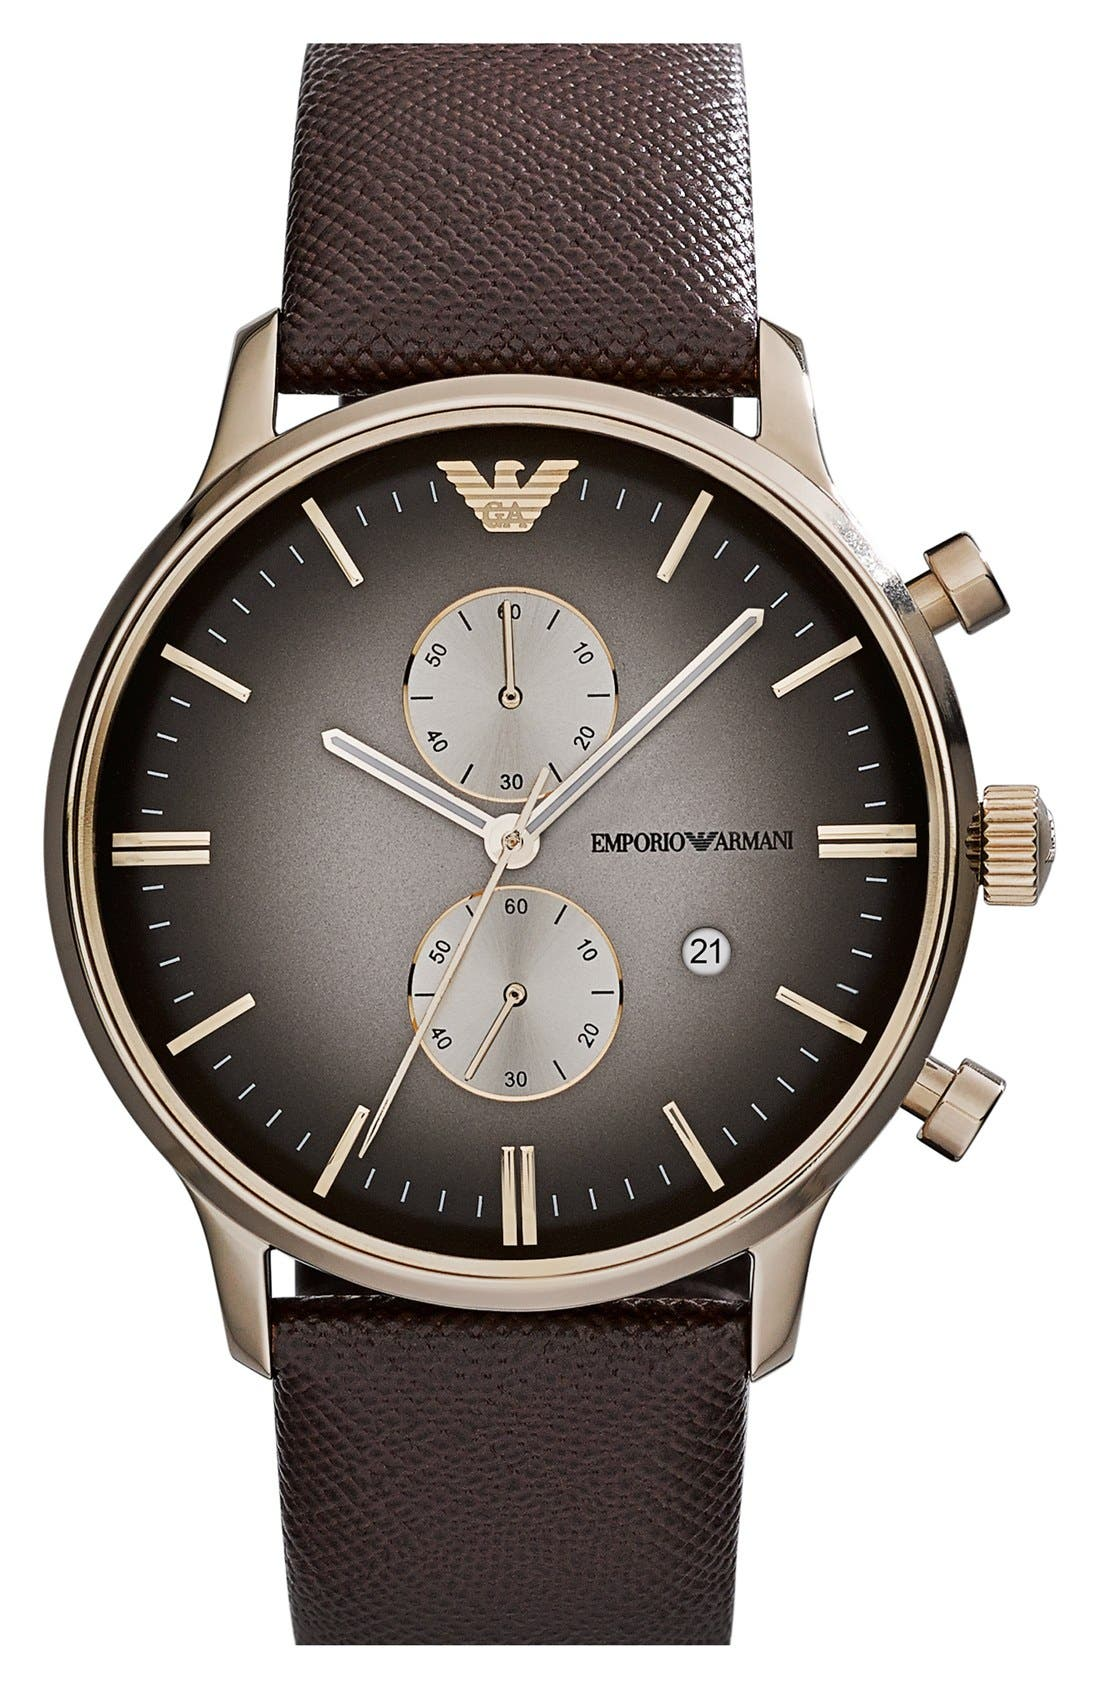 Main Image - Emporio Armani Chronograph Leather Strap Watch, 43mm